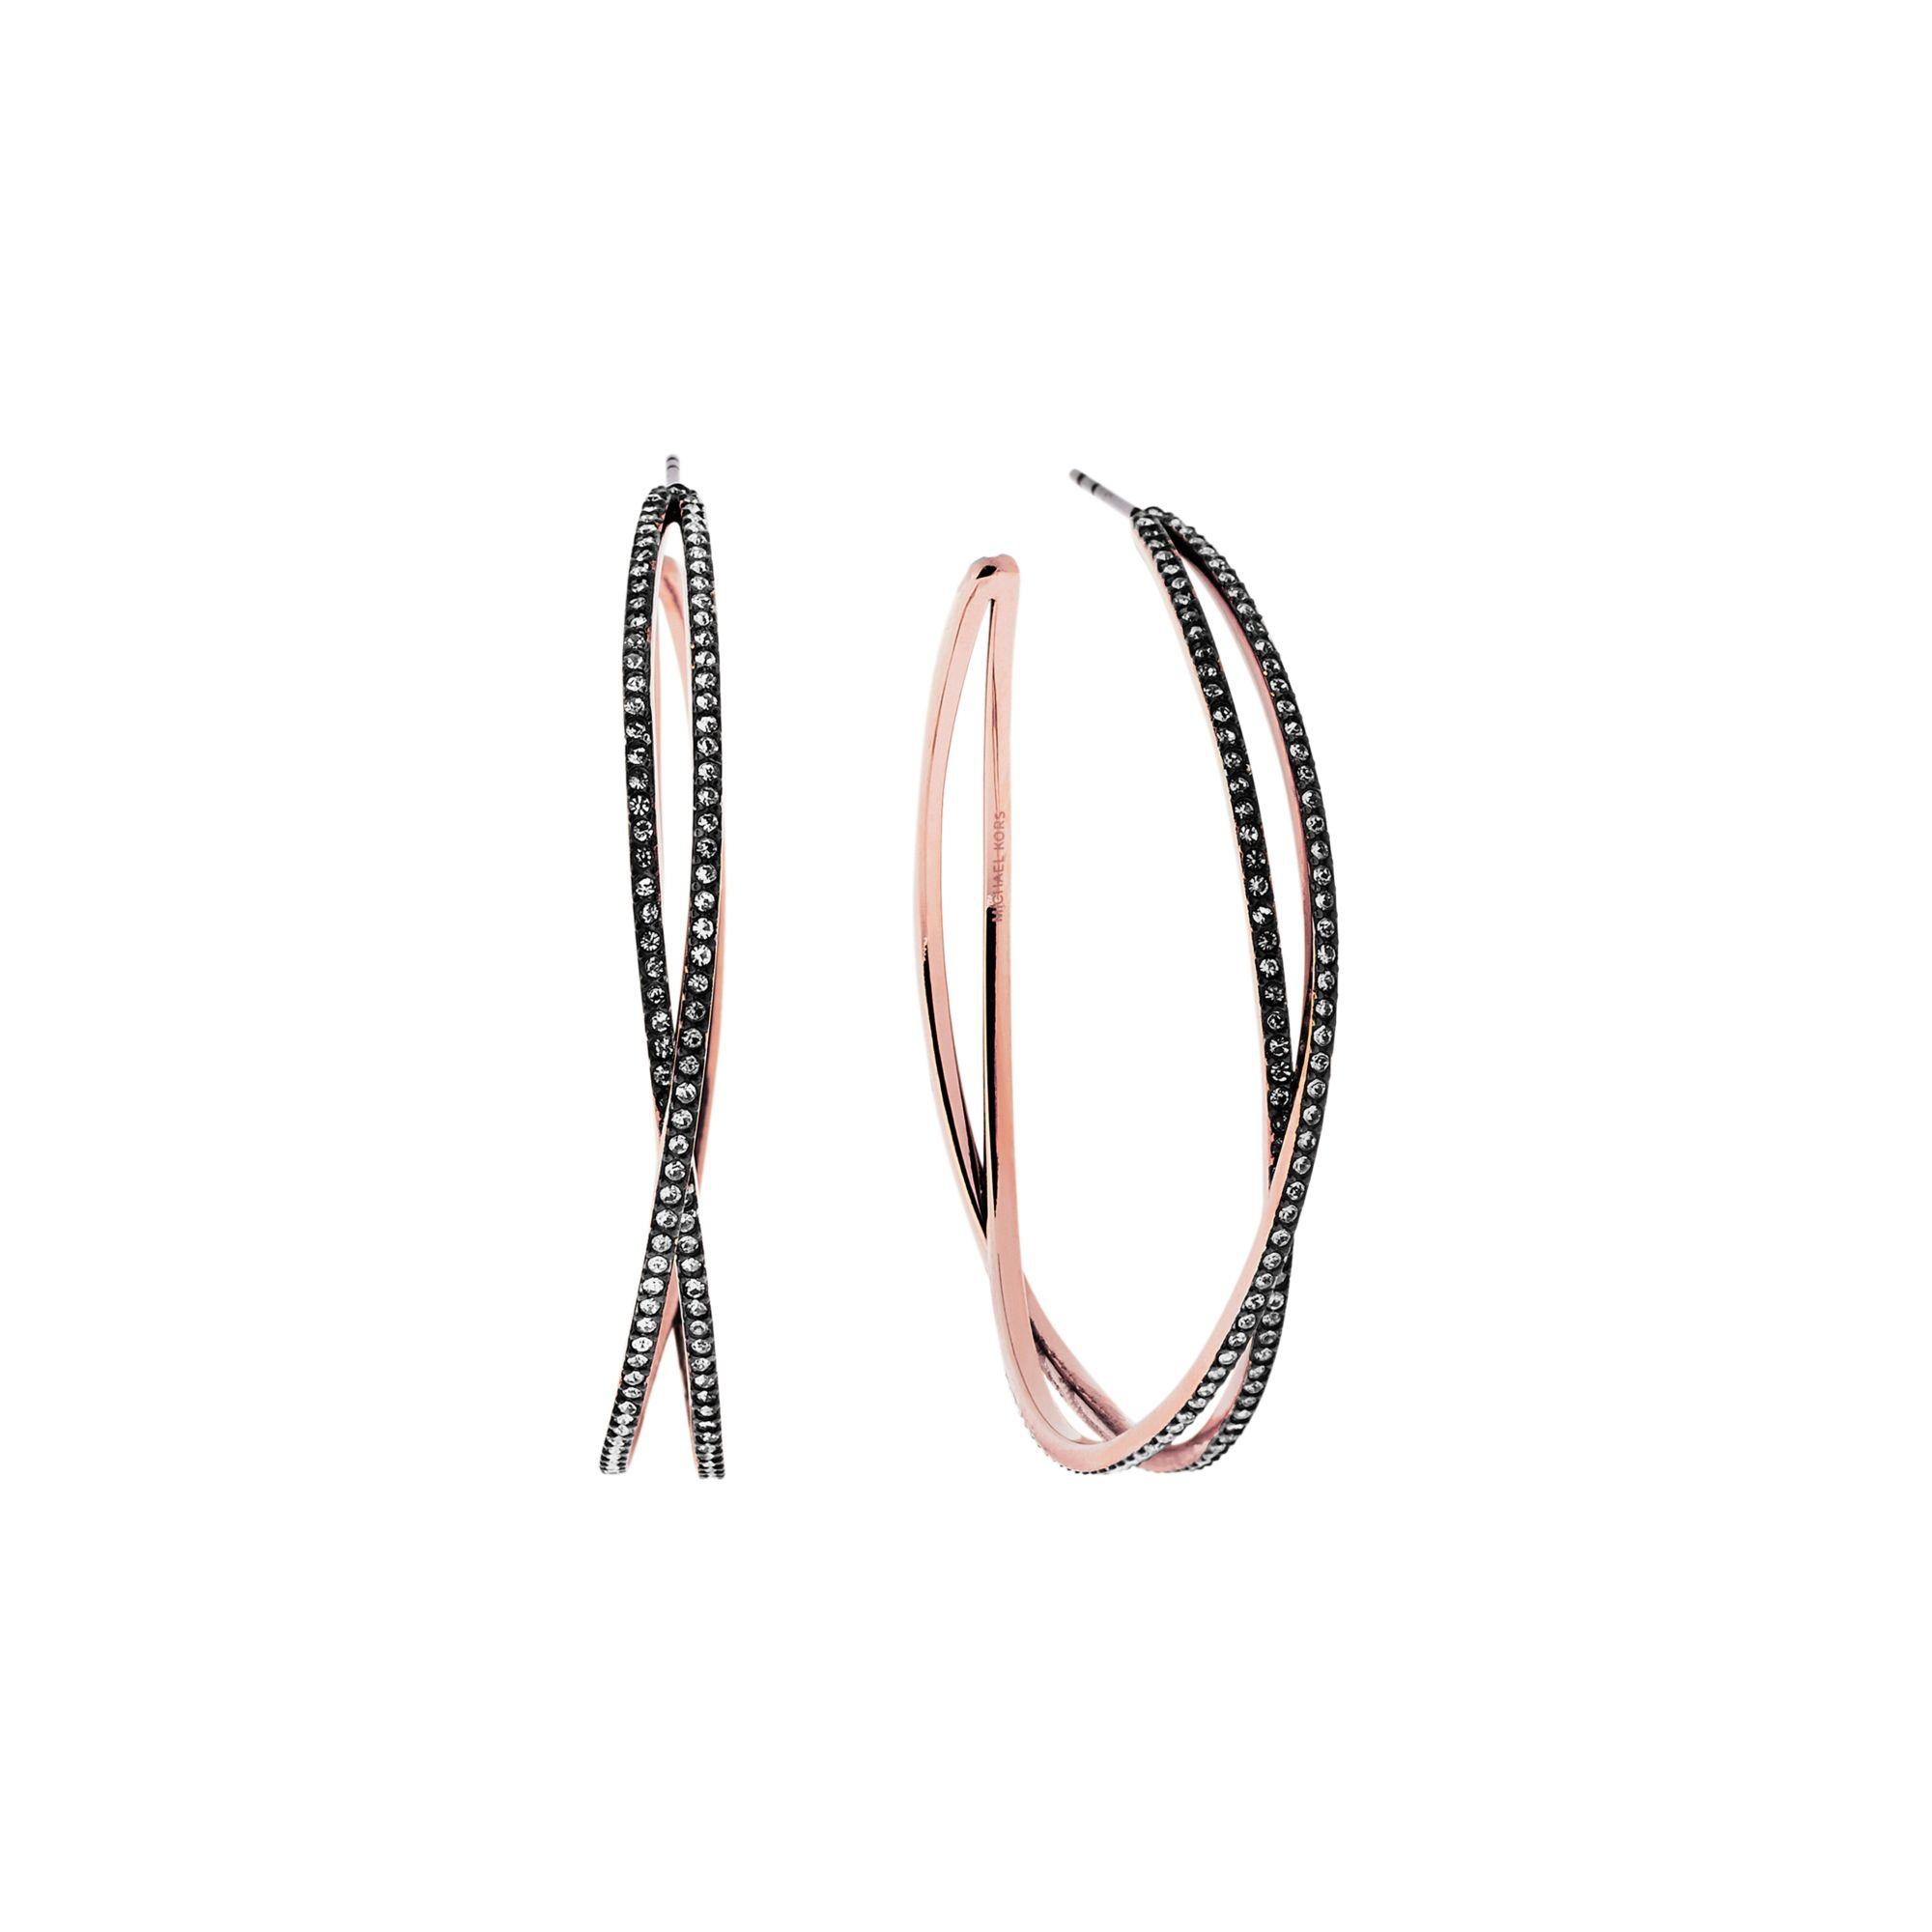 553509ec29e6 Lyst - Michael Kors Pavé Rose Gold-tone Criss-cross Hoop Earrings in ...